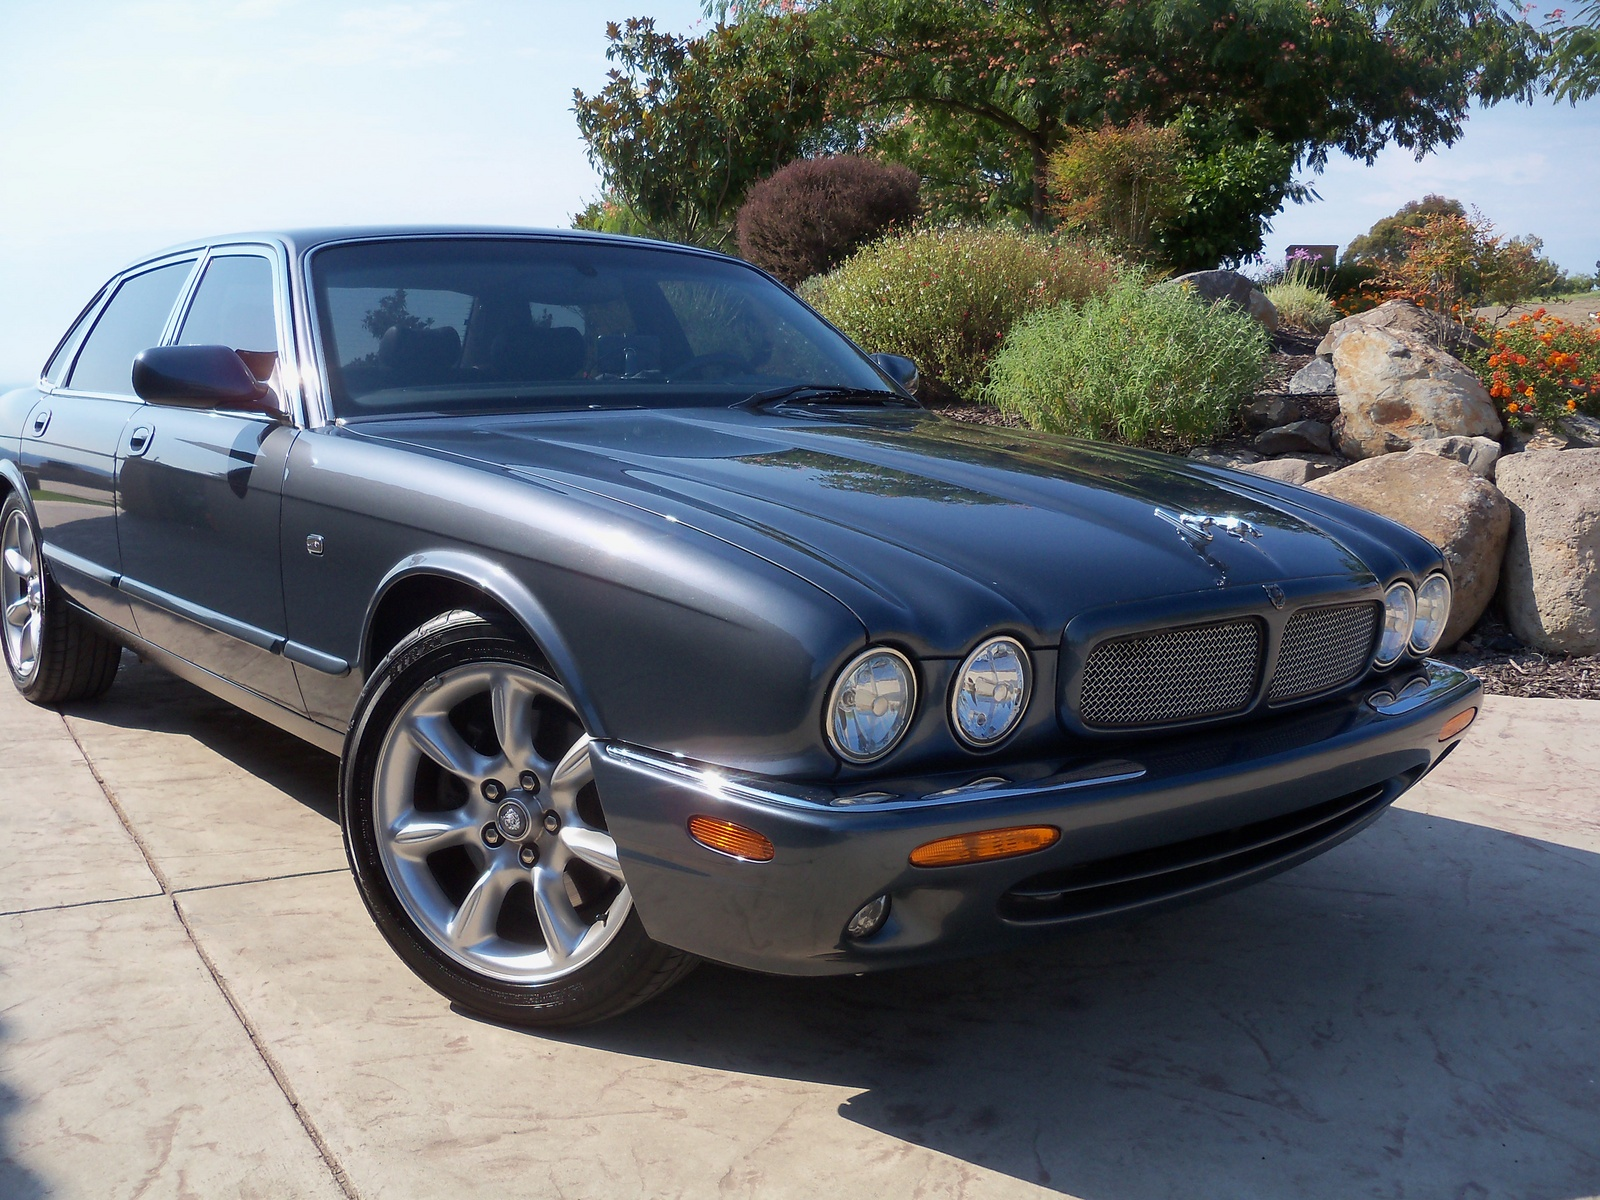 2001 Jaguar XJR - Pictures - CarGurus